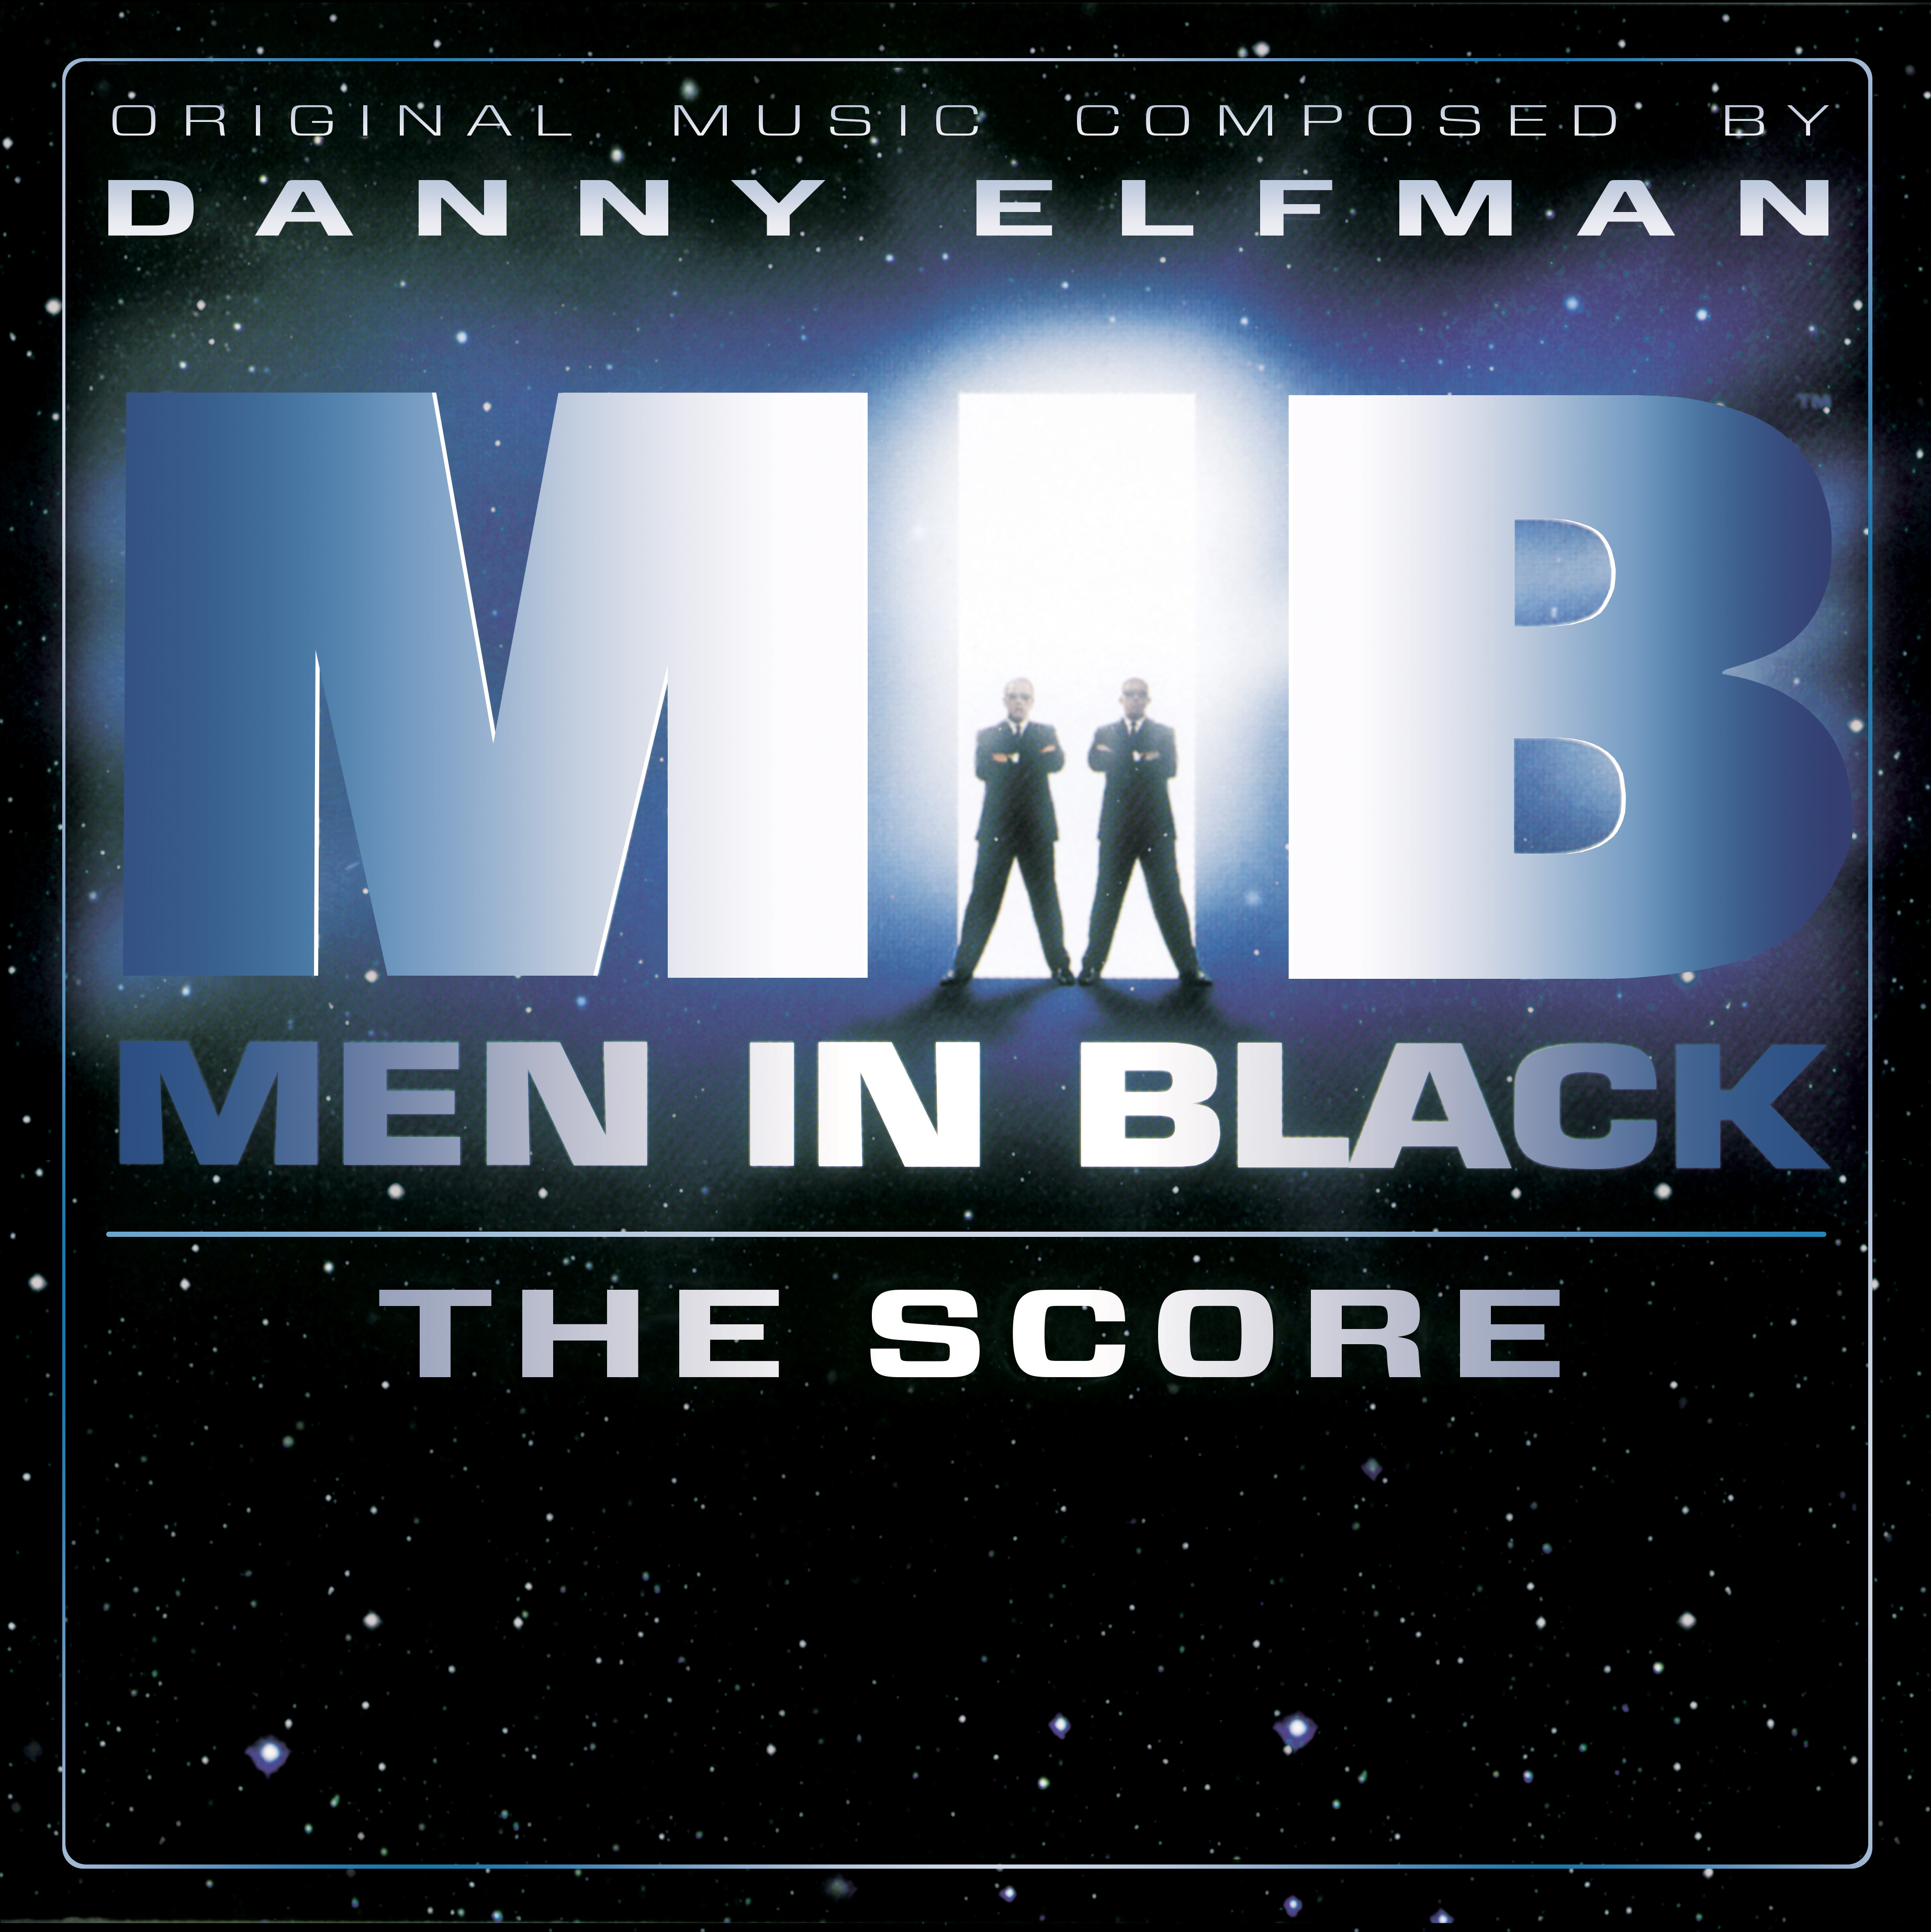 ett013 etr068 men in black cover front hires Danny Elfmans Men in Black score coming to vinyl for first time